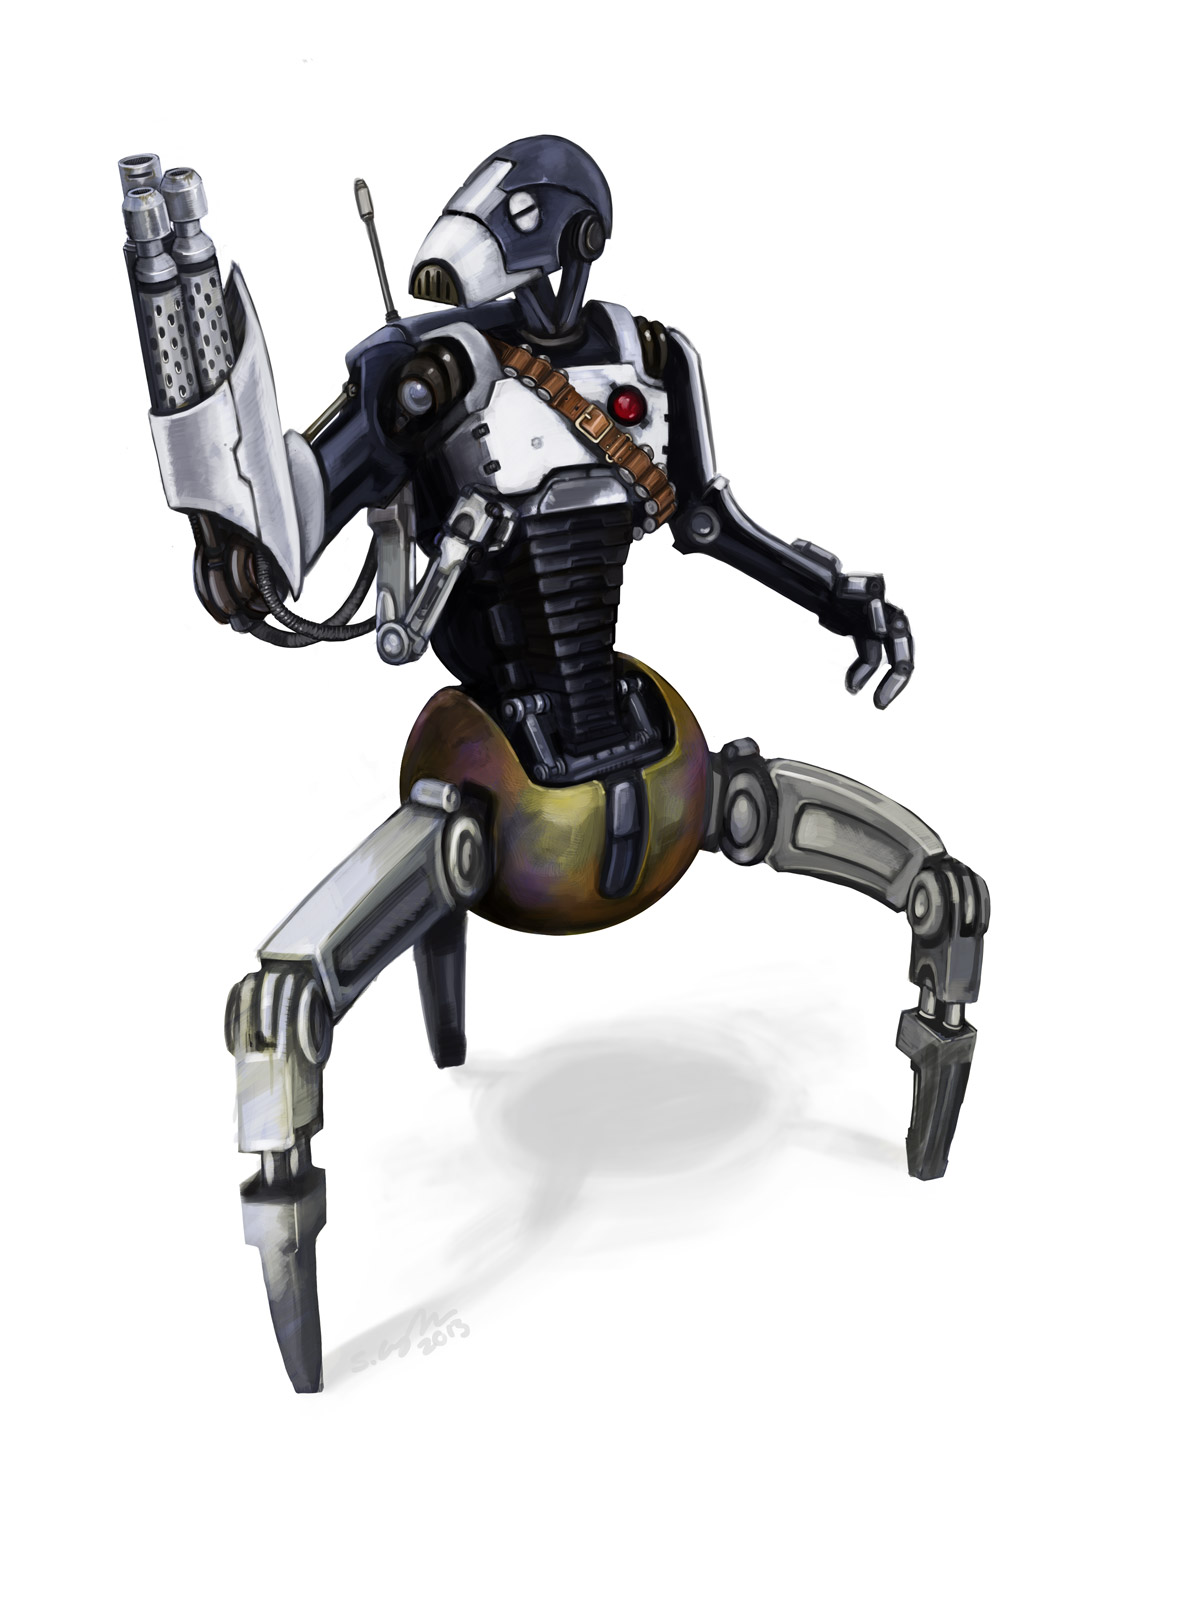 Star Wars Droids App by Sphero App Download - Android APK